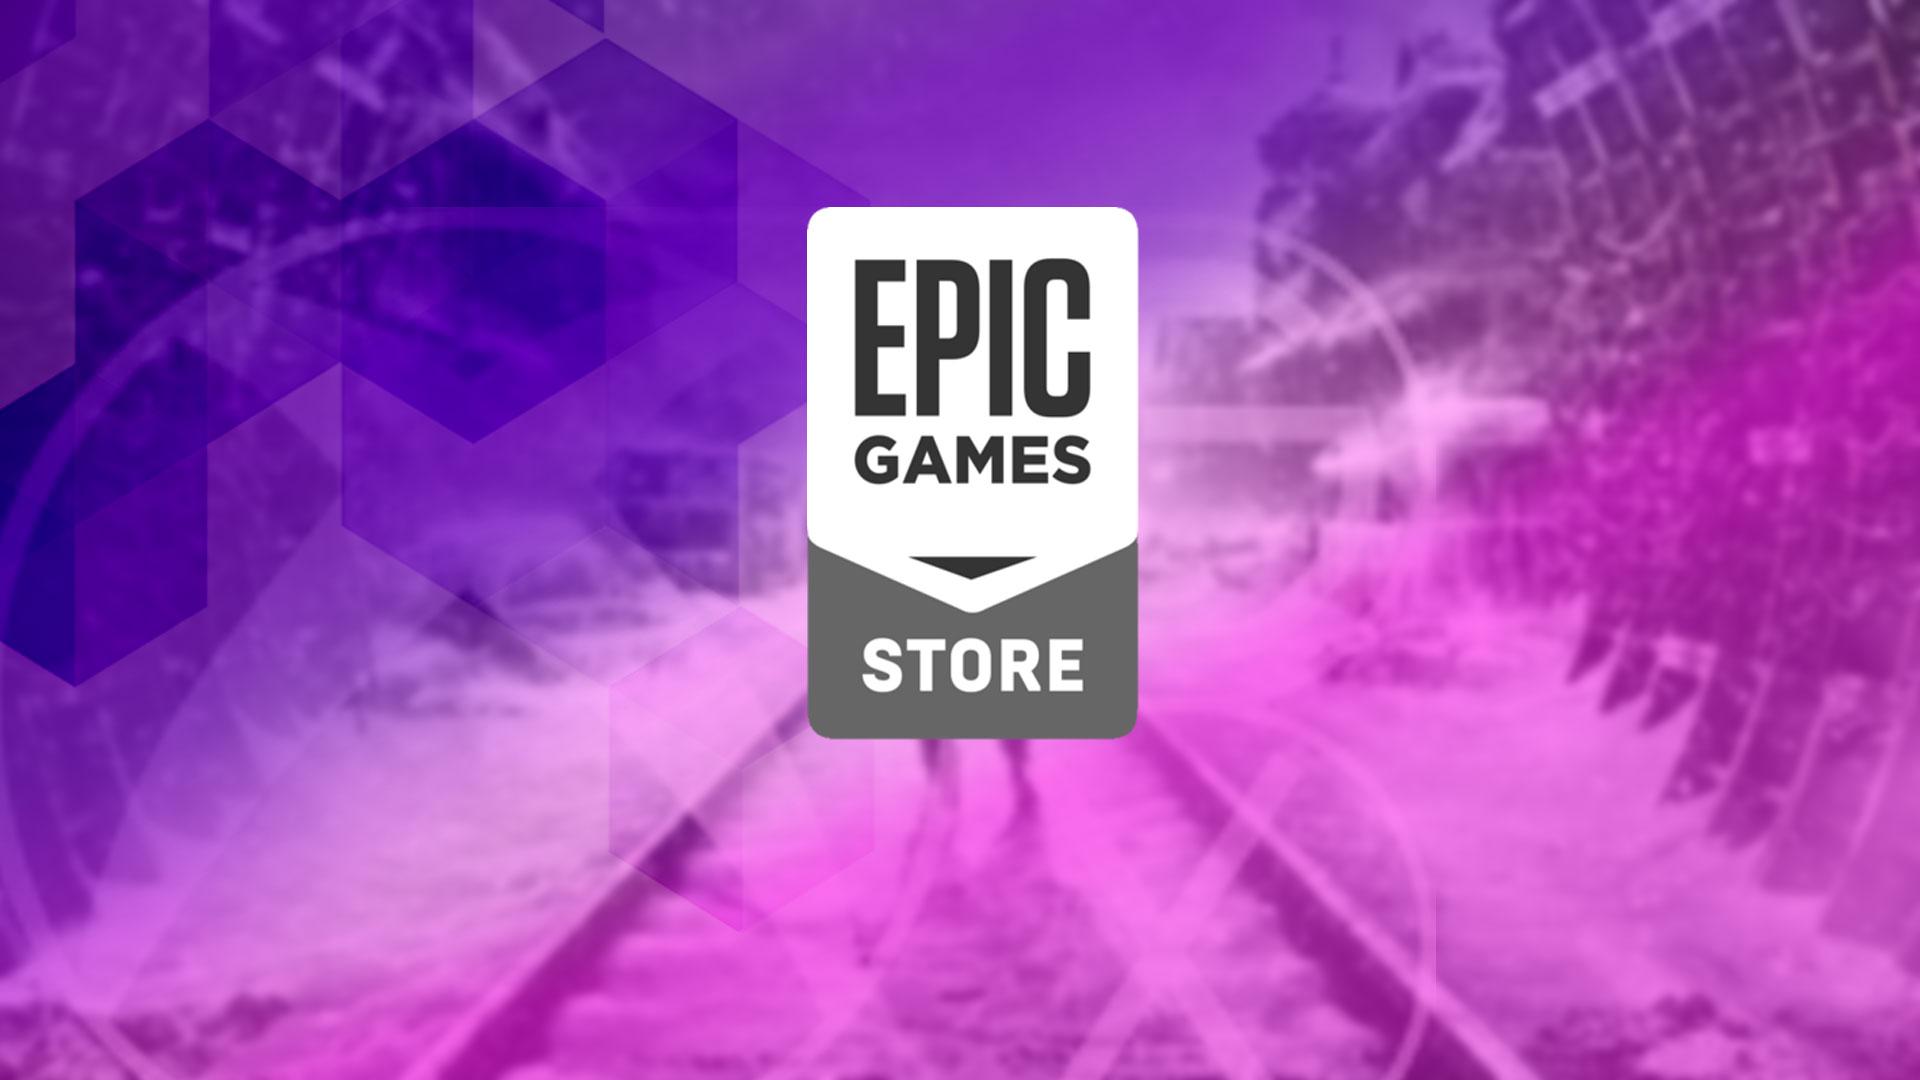 Epic Games වෙතින්  නත්තලට තෑගි 🎄